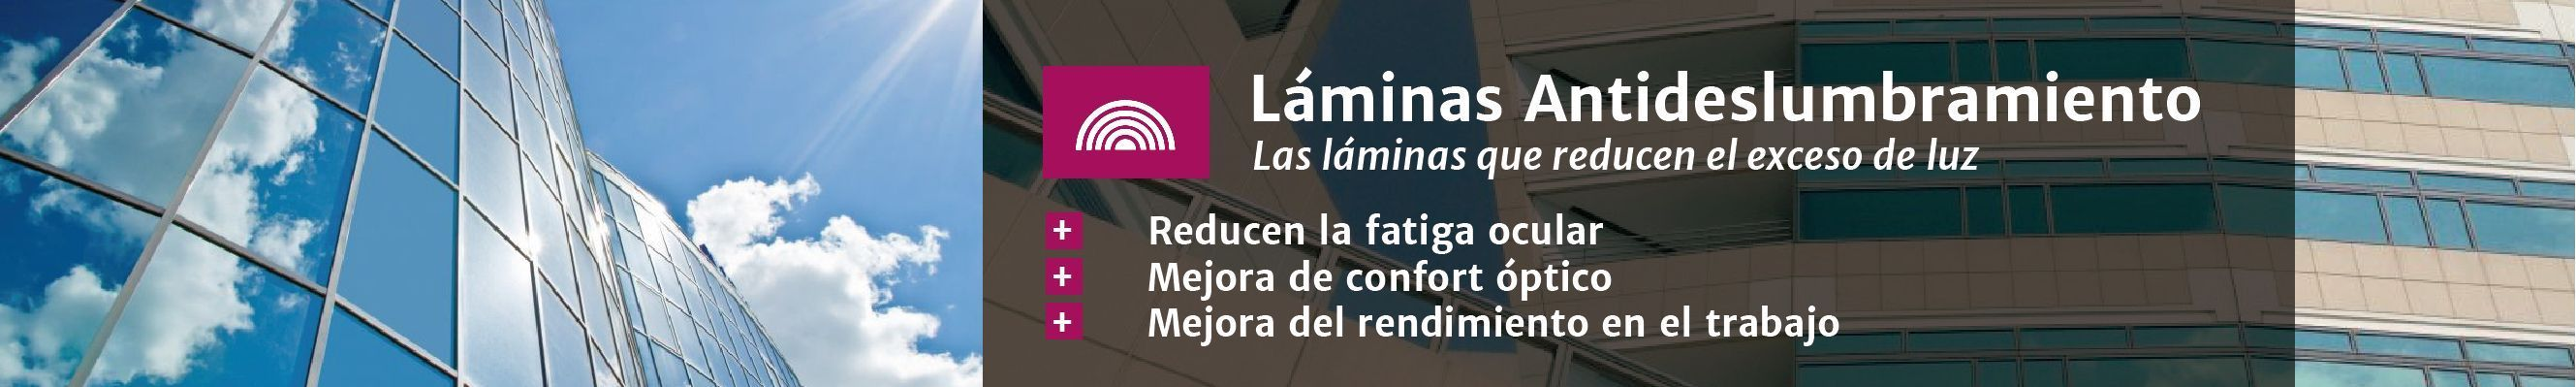 Láminas antideslumbramiento en Laminotech